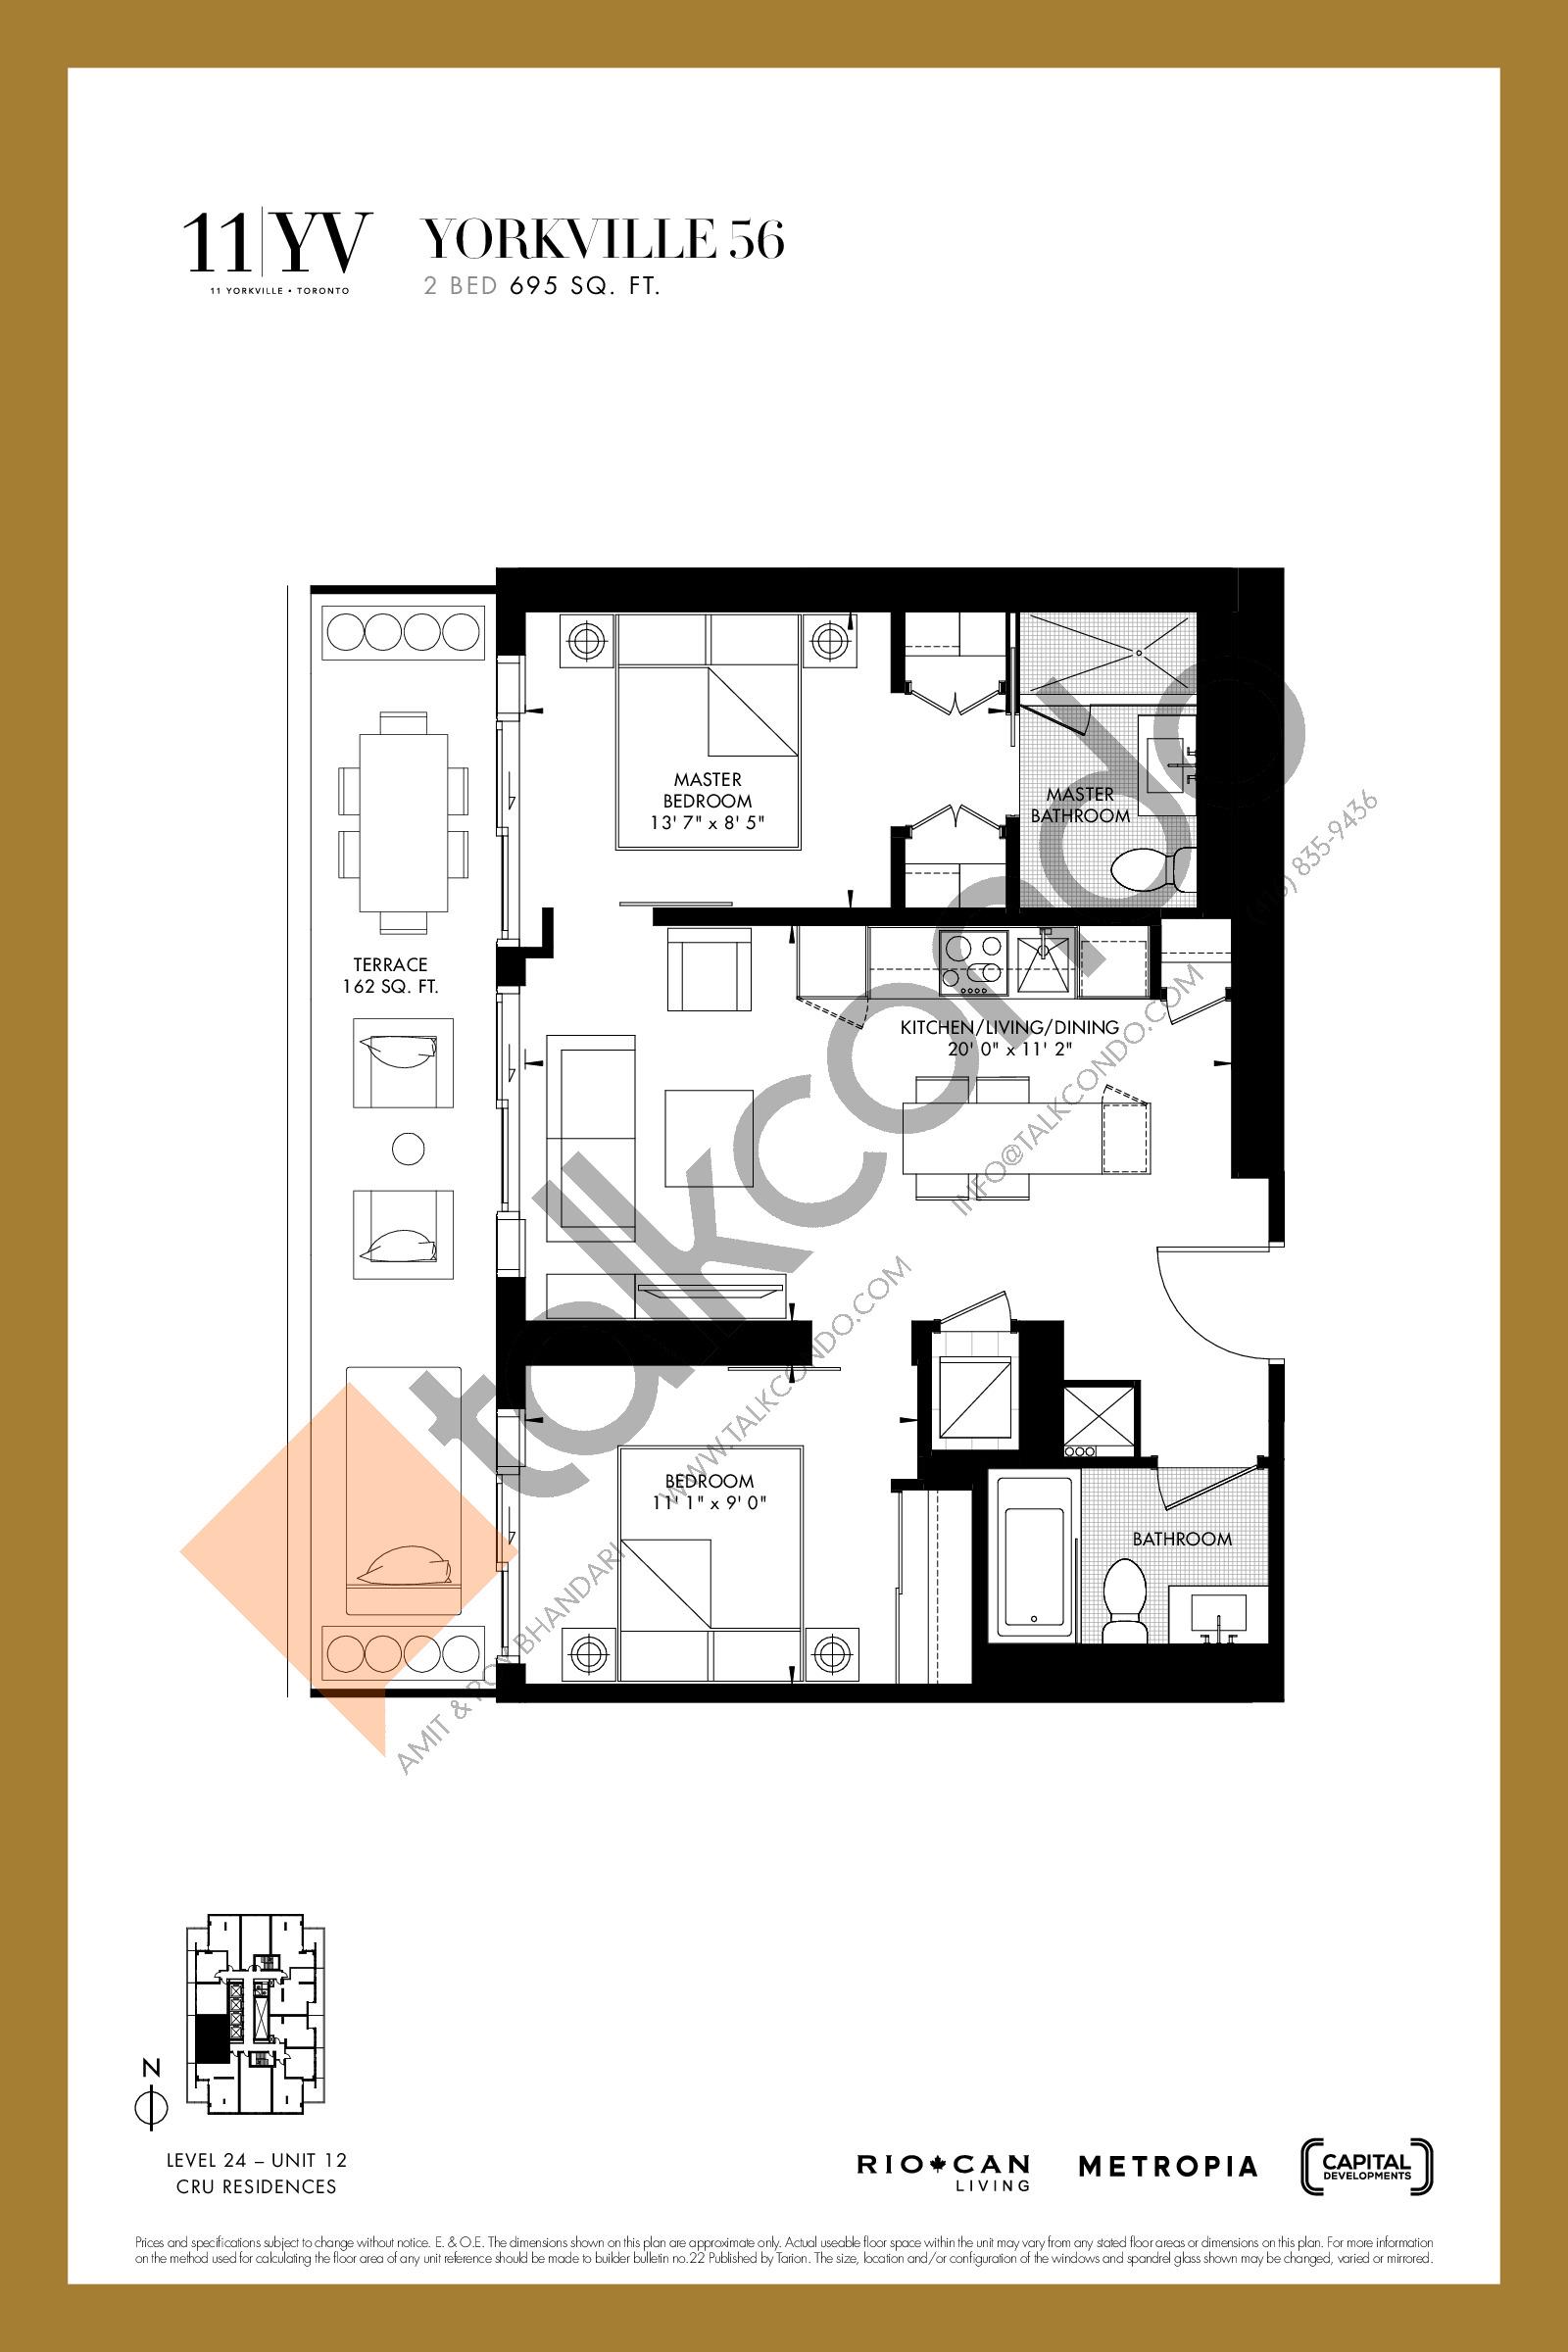 Yorkville 56 Floor Plan at 11YV Condos - 695 sq.ft